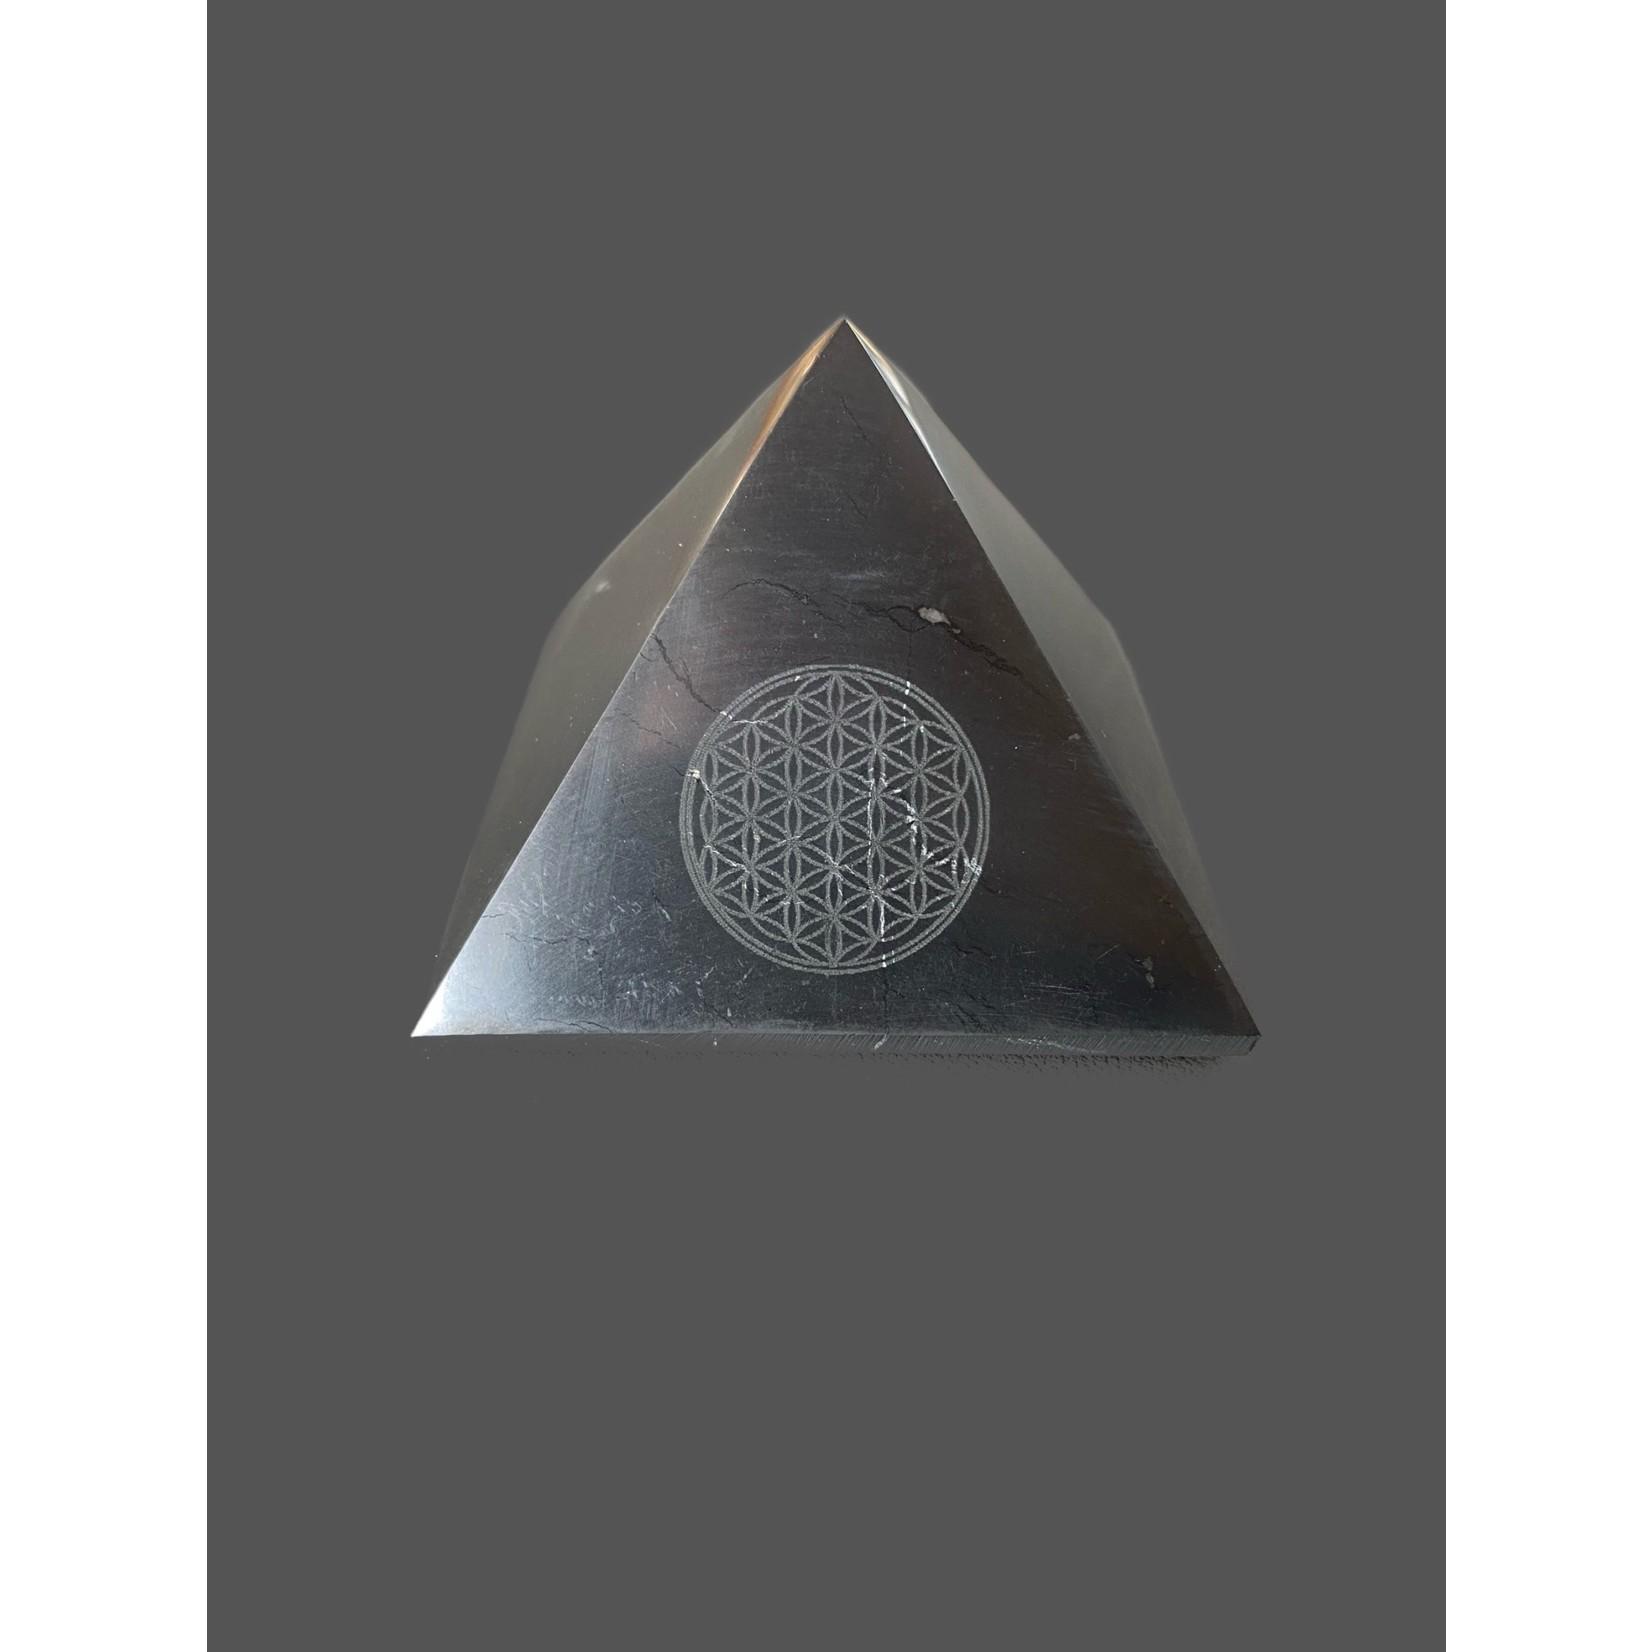 Pirámide Shungit Flor Vida 7cm